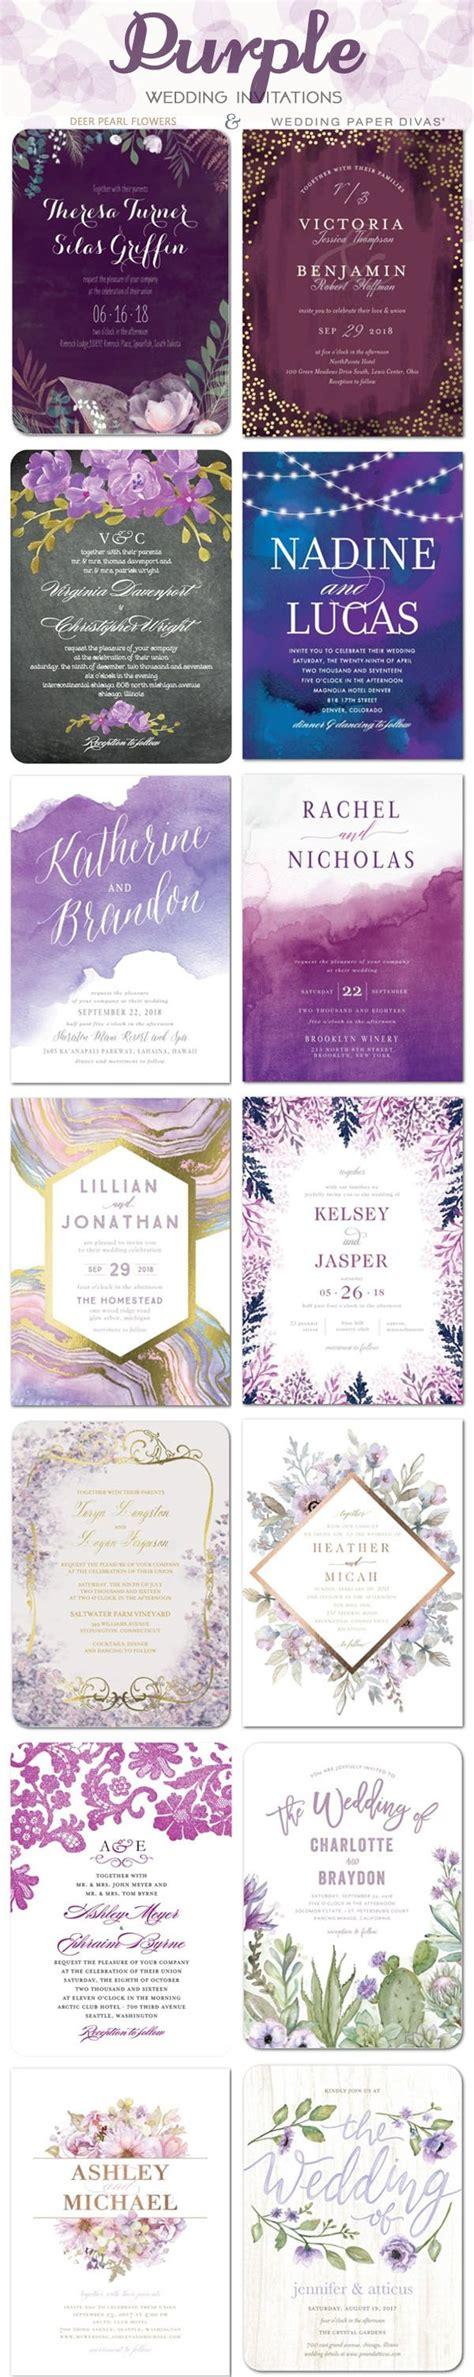 peridot wedding invitation paper best 25 wisteria wedding ideas on